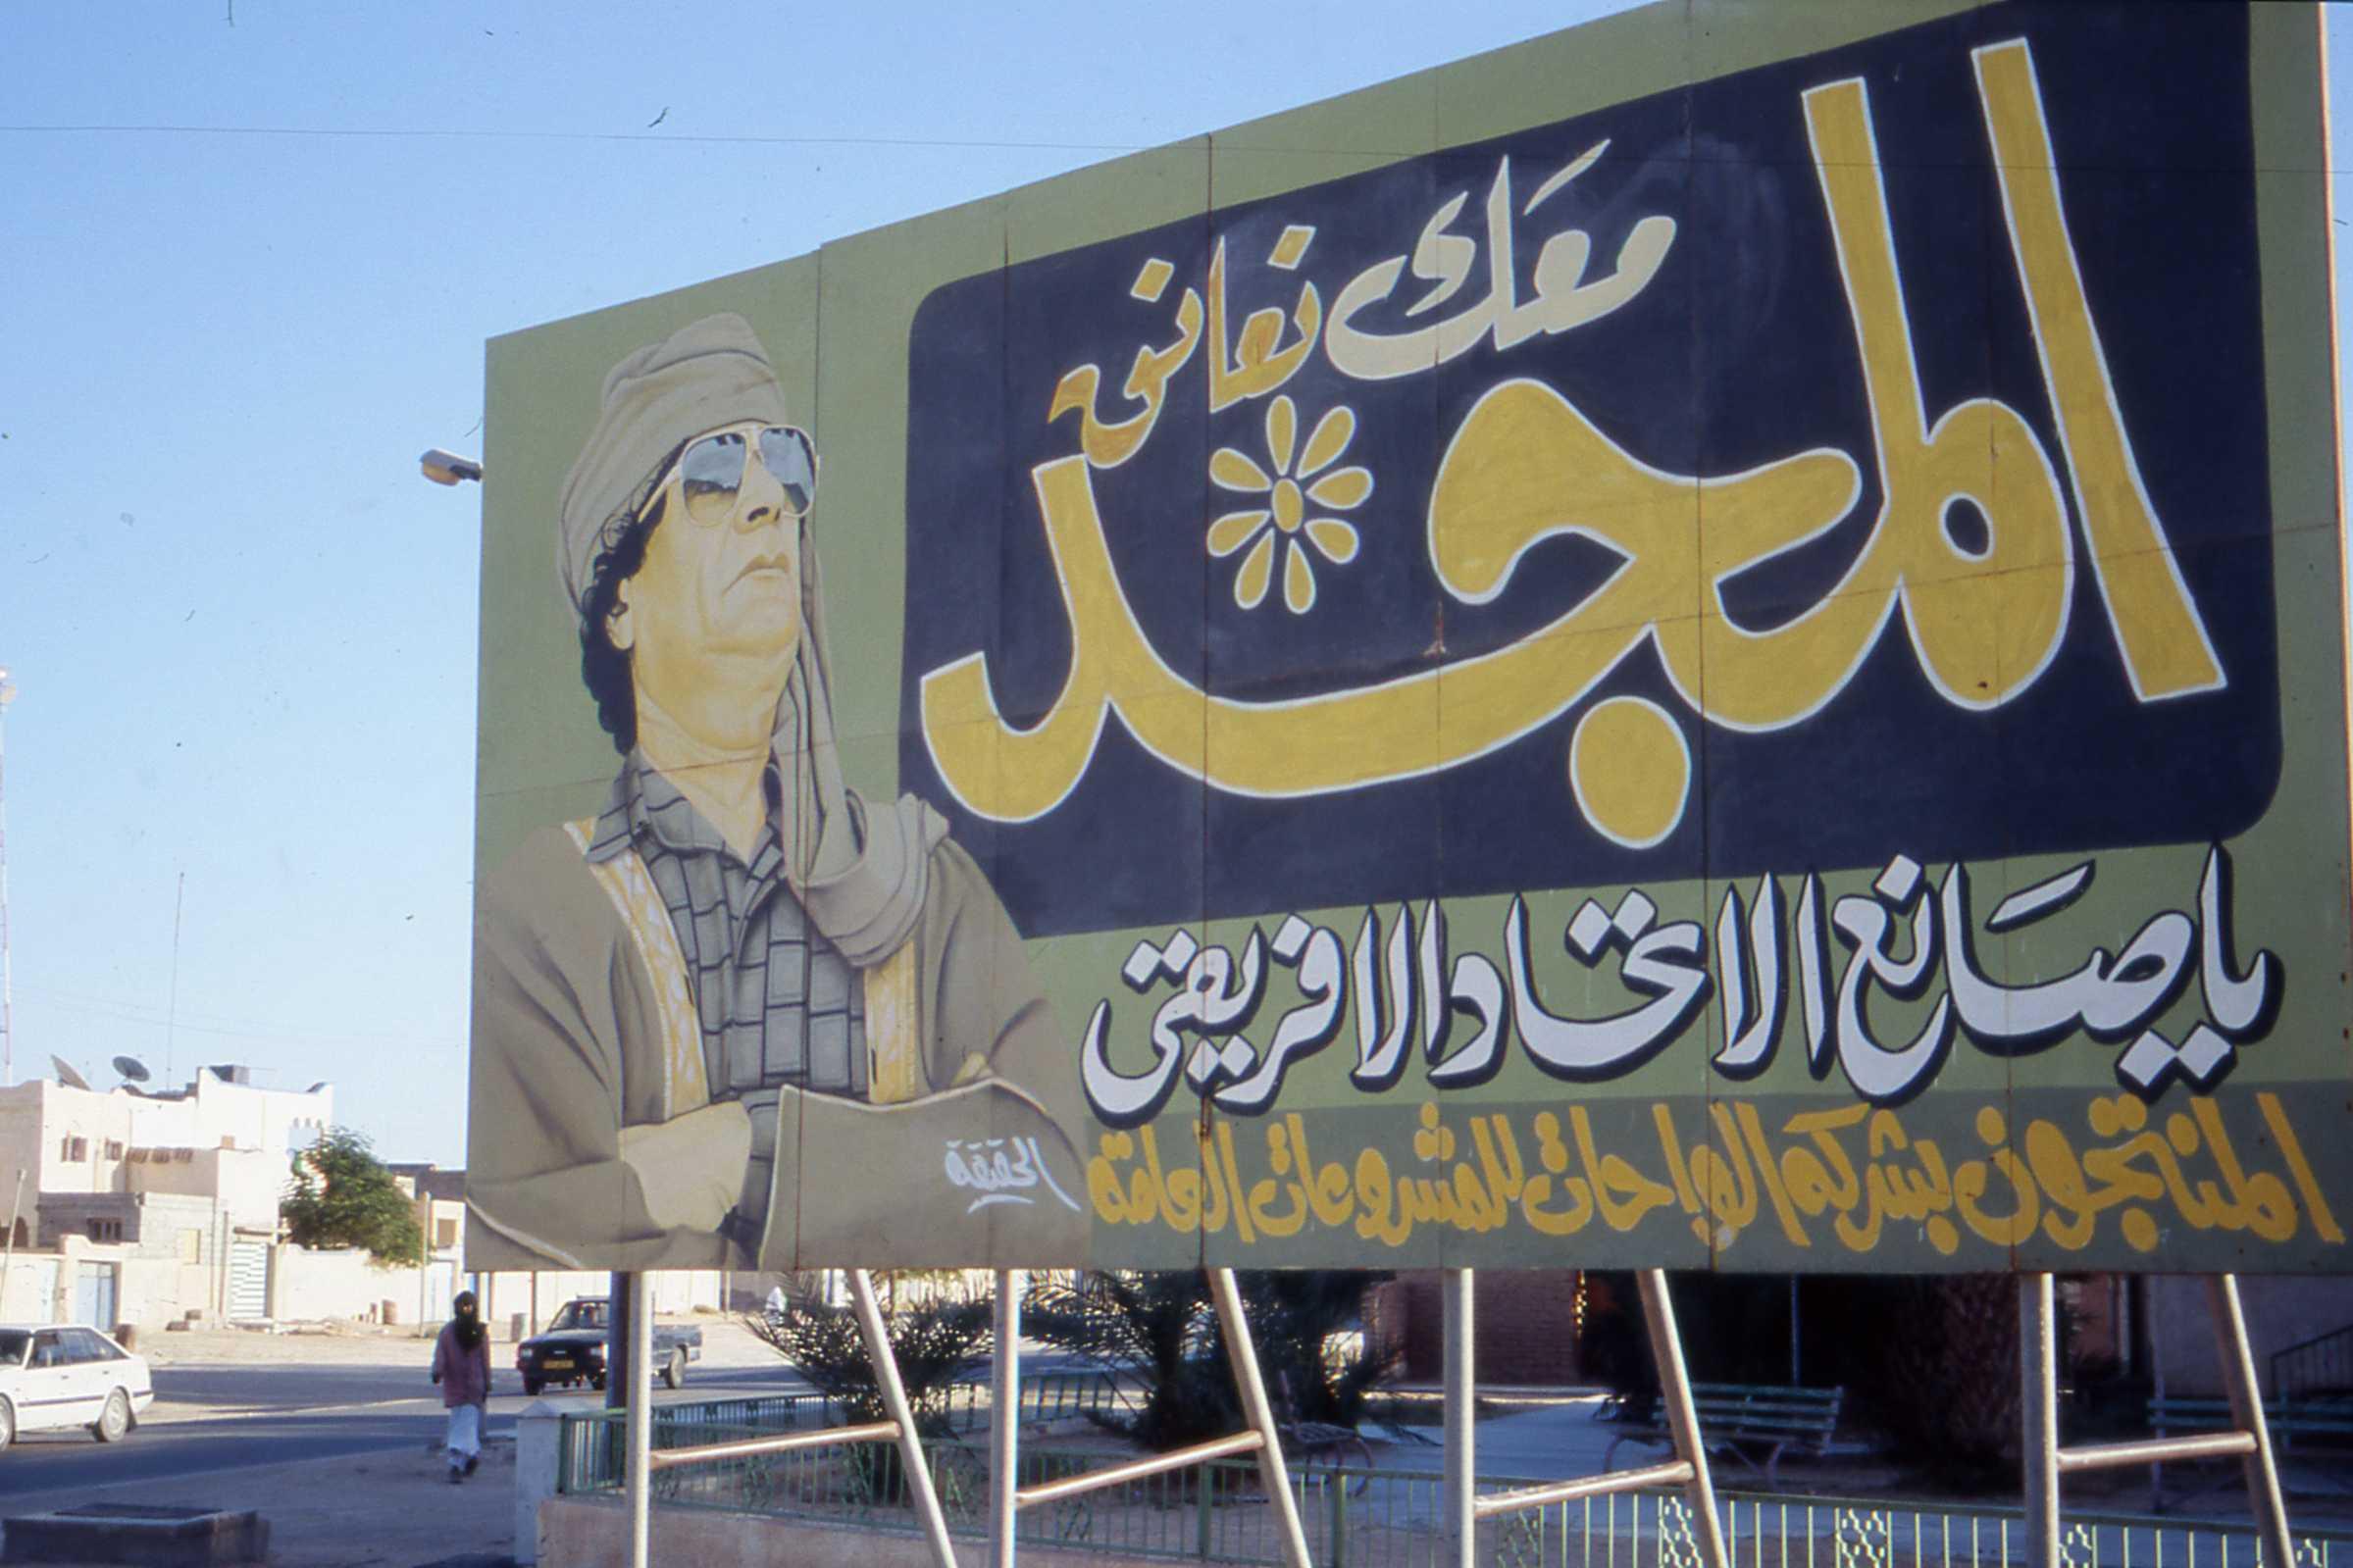 OVERBLIK: Her er Gaddafi-familien